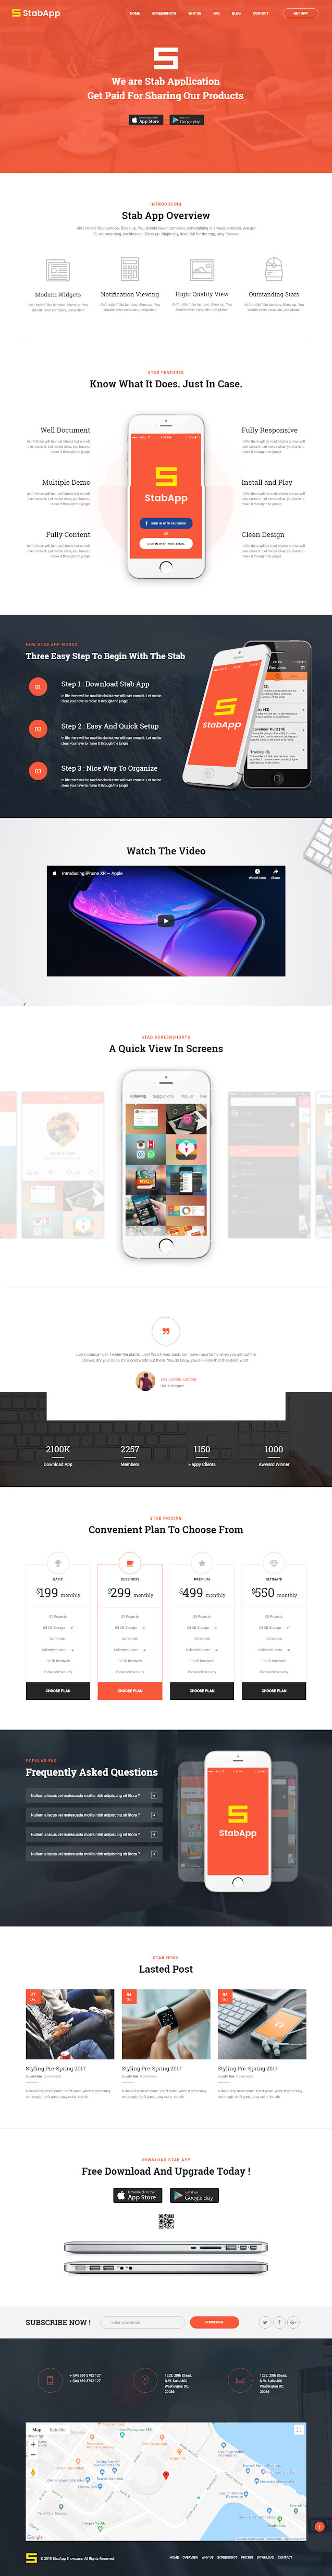 stabapp best premium mobile app wordpress themes - 10+ Best Premium Mobile App WordPress Themes